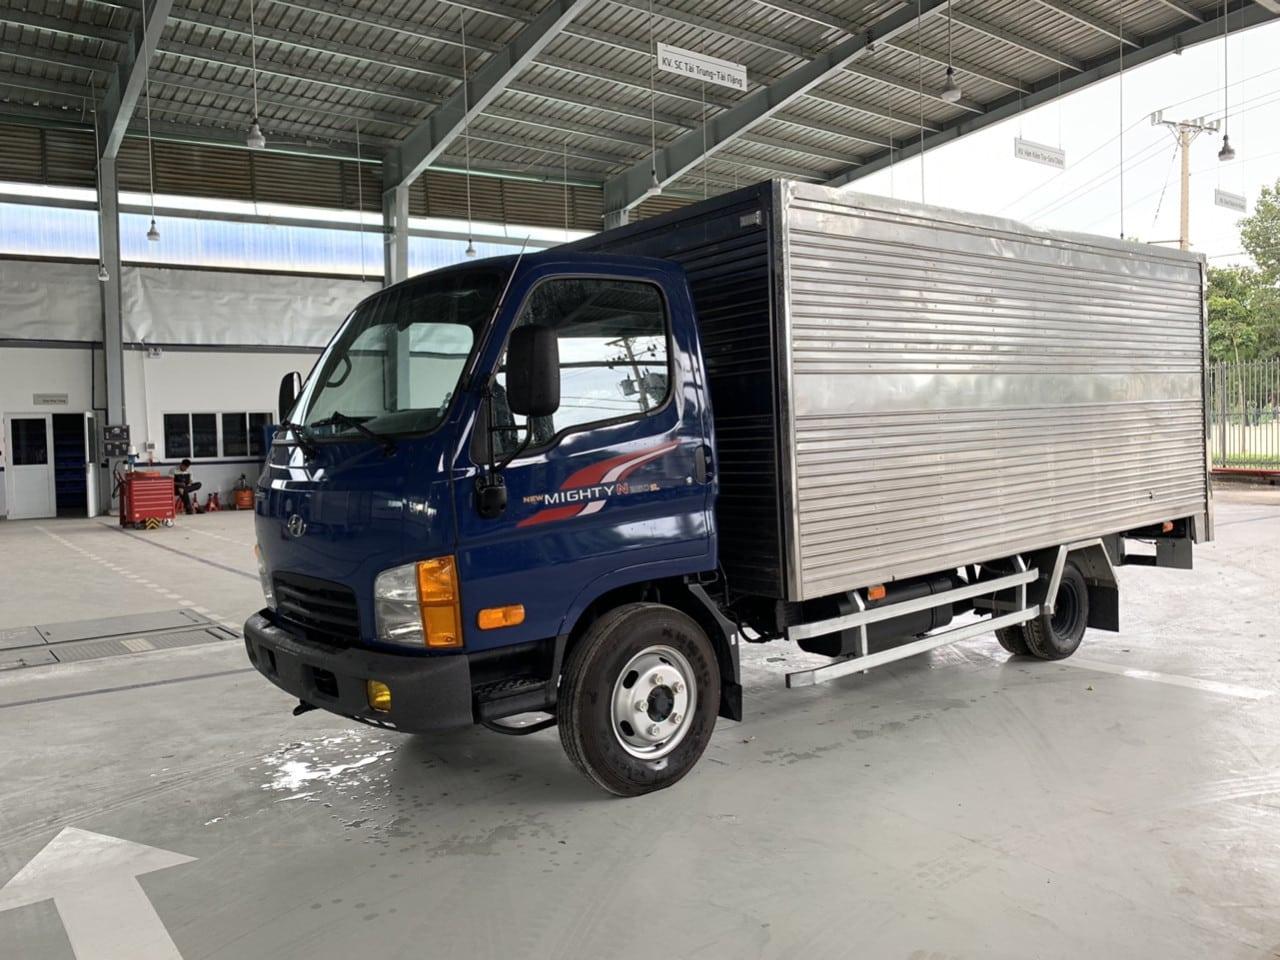 Nên mua xe tải nhỏ 2 tấn hãng nào